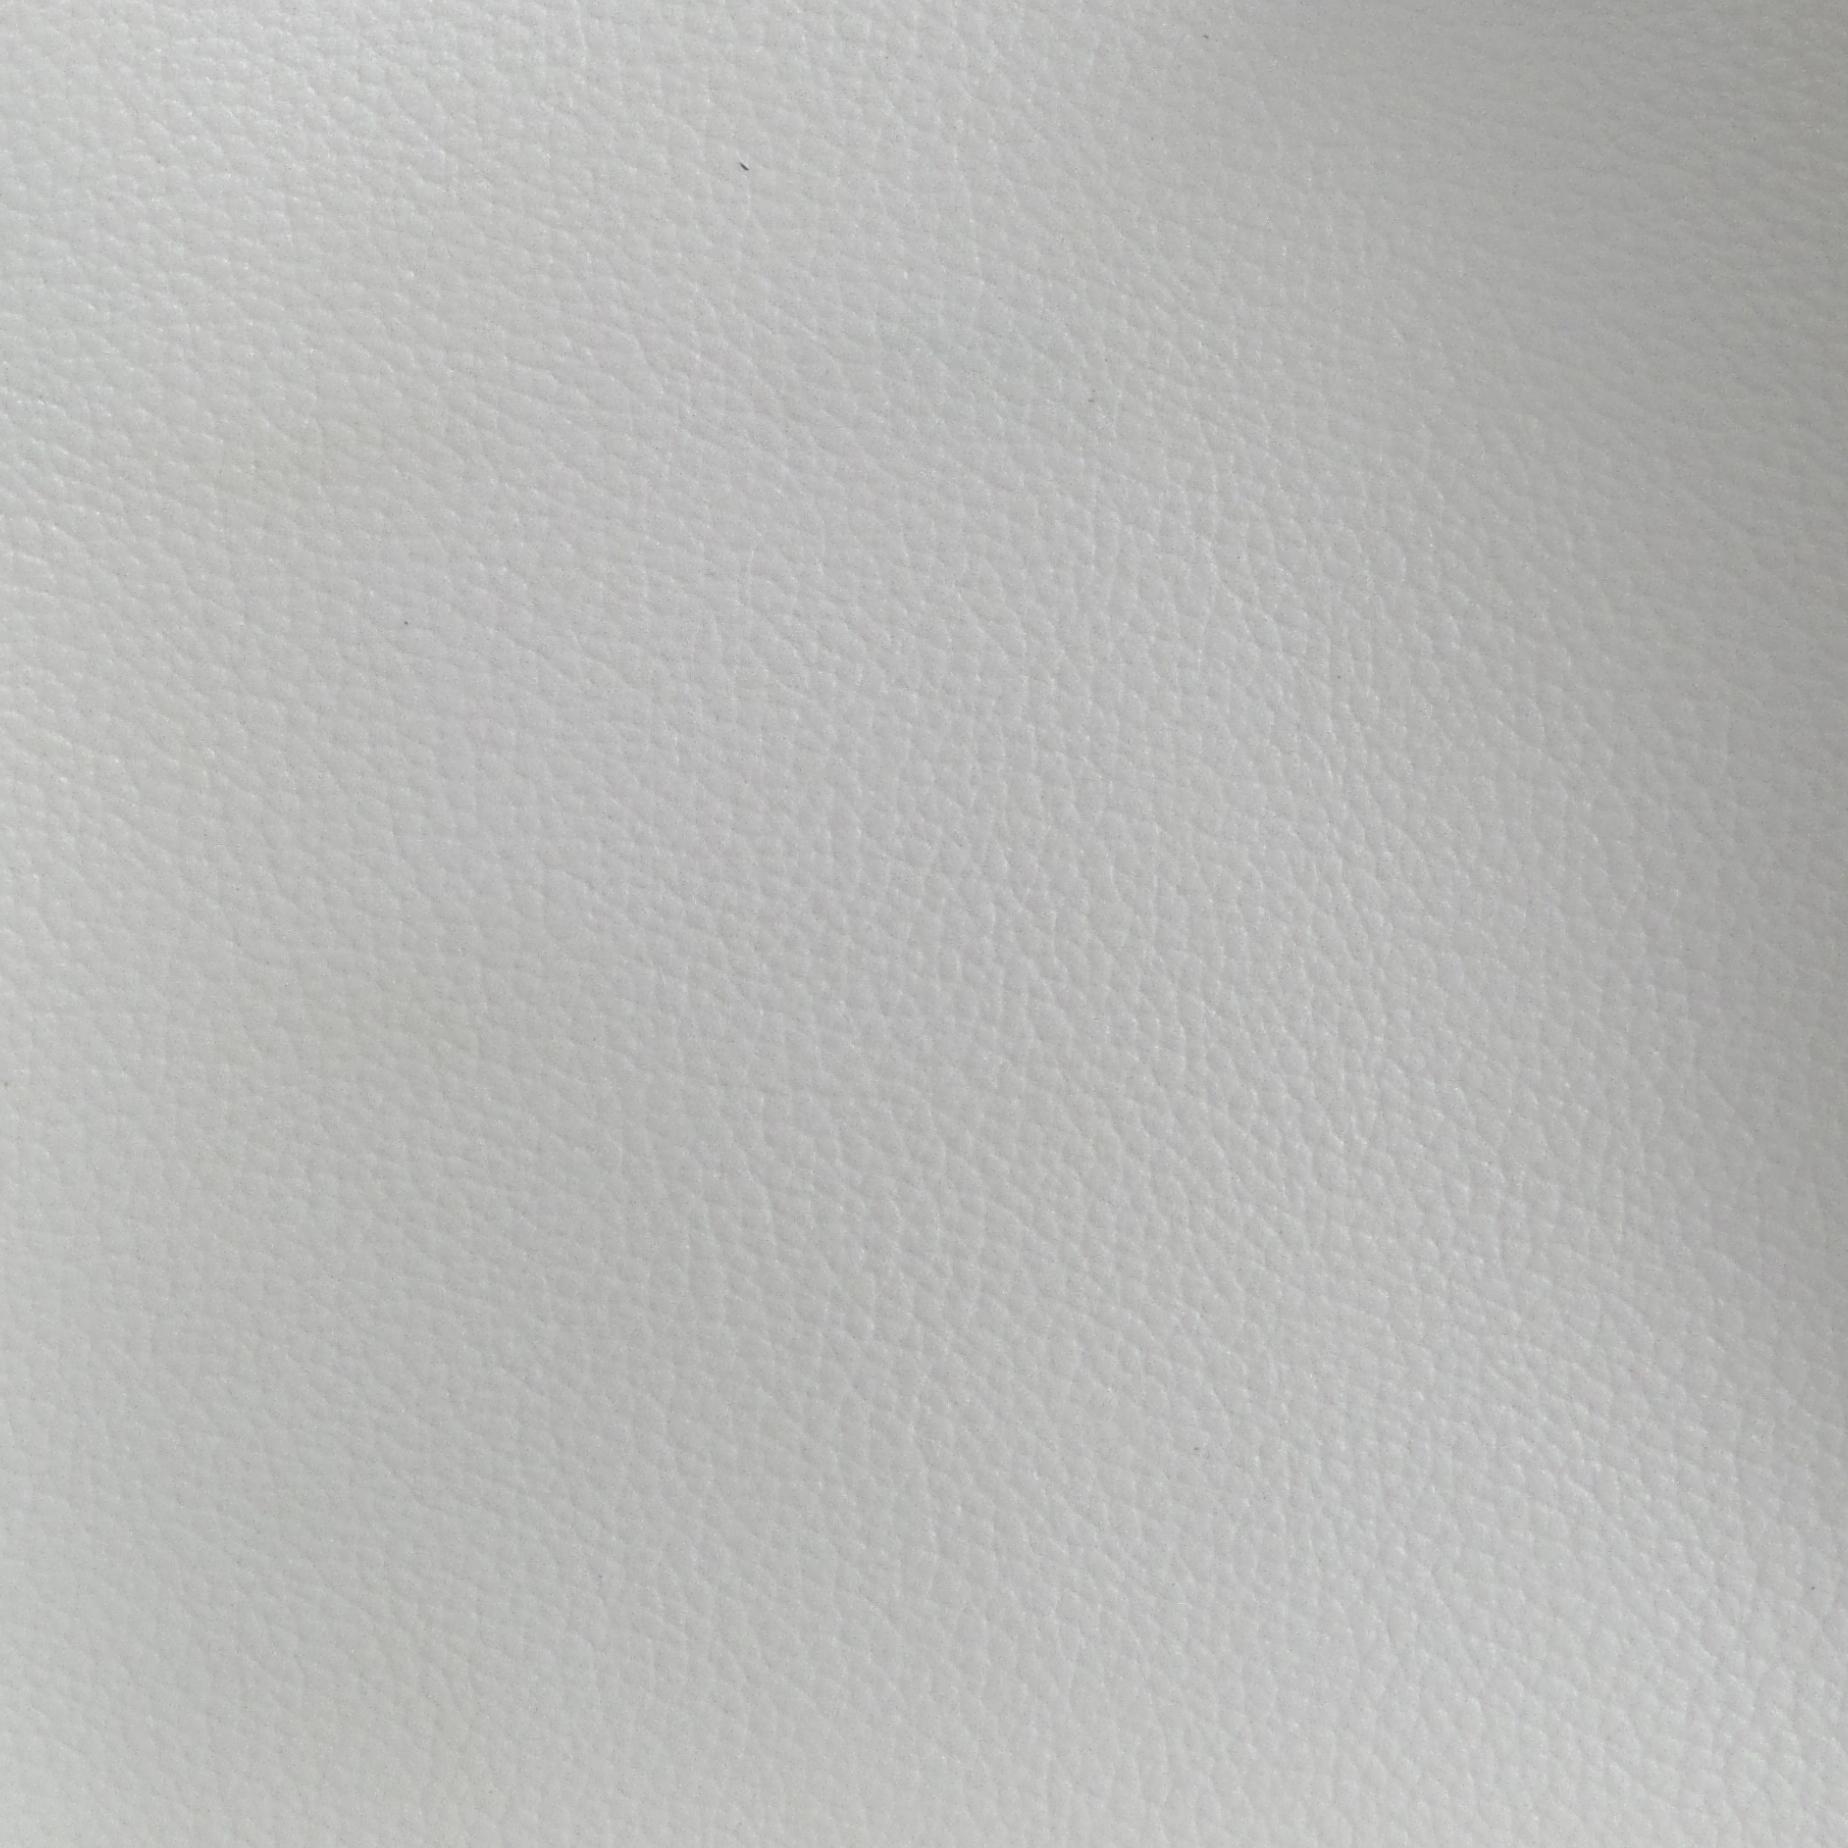 Venty Broken White Leather Sample